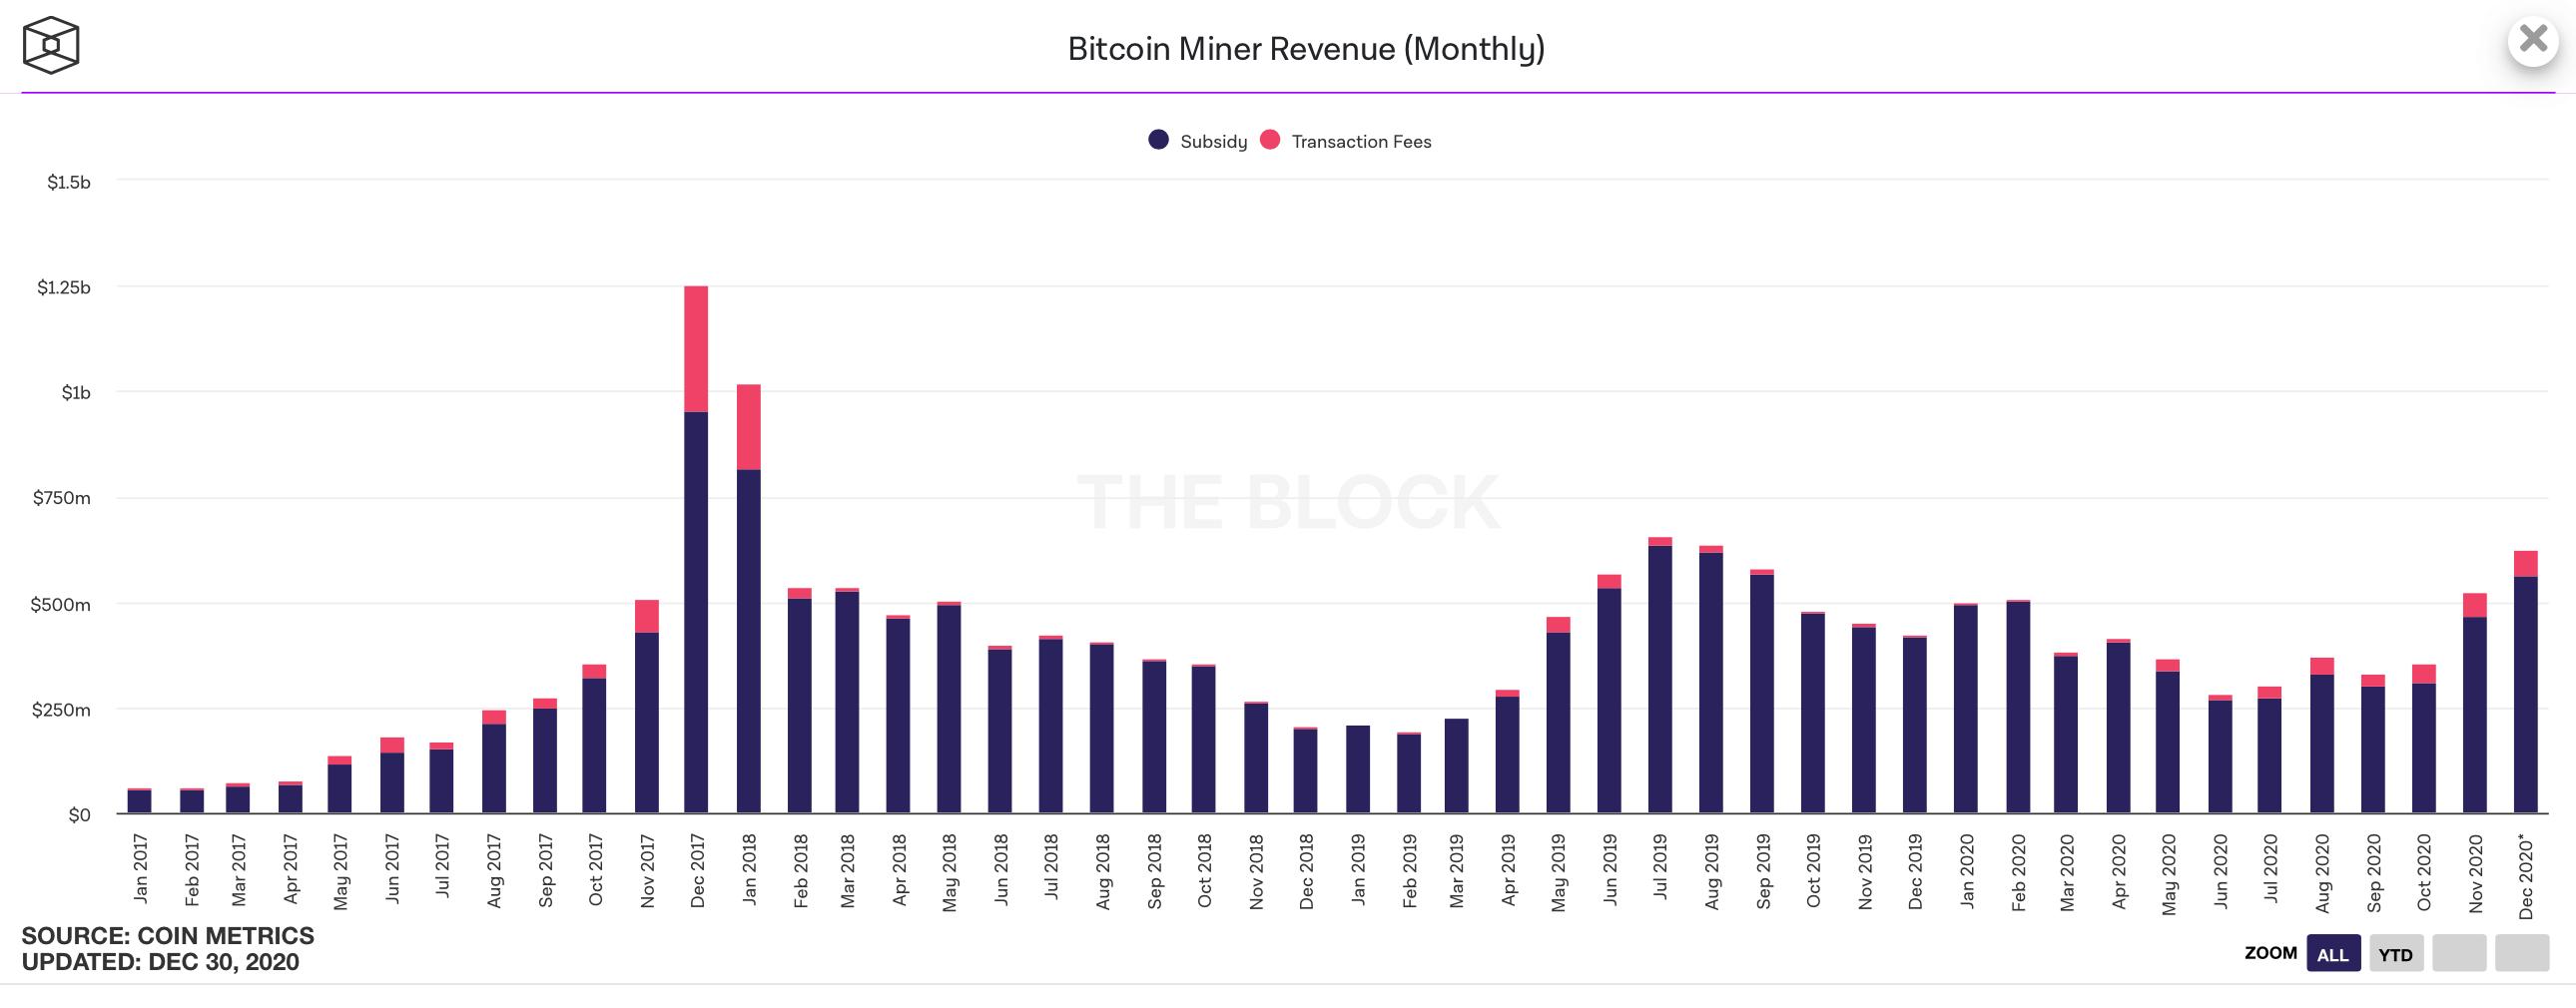 Доход майнеров Биткоина по месяцам